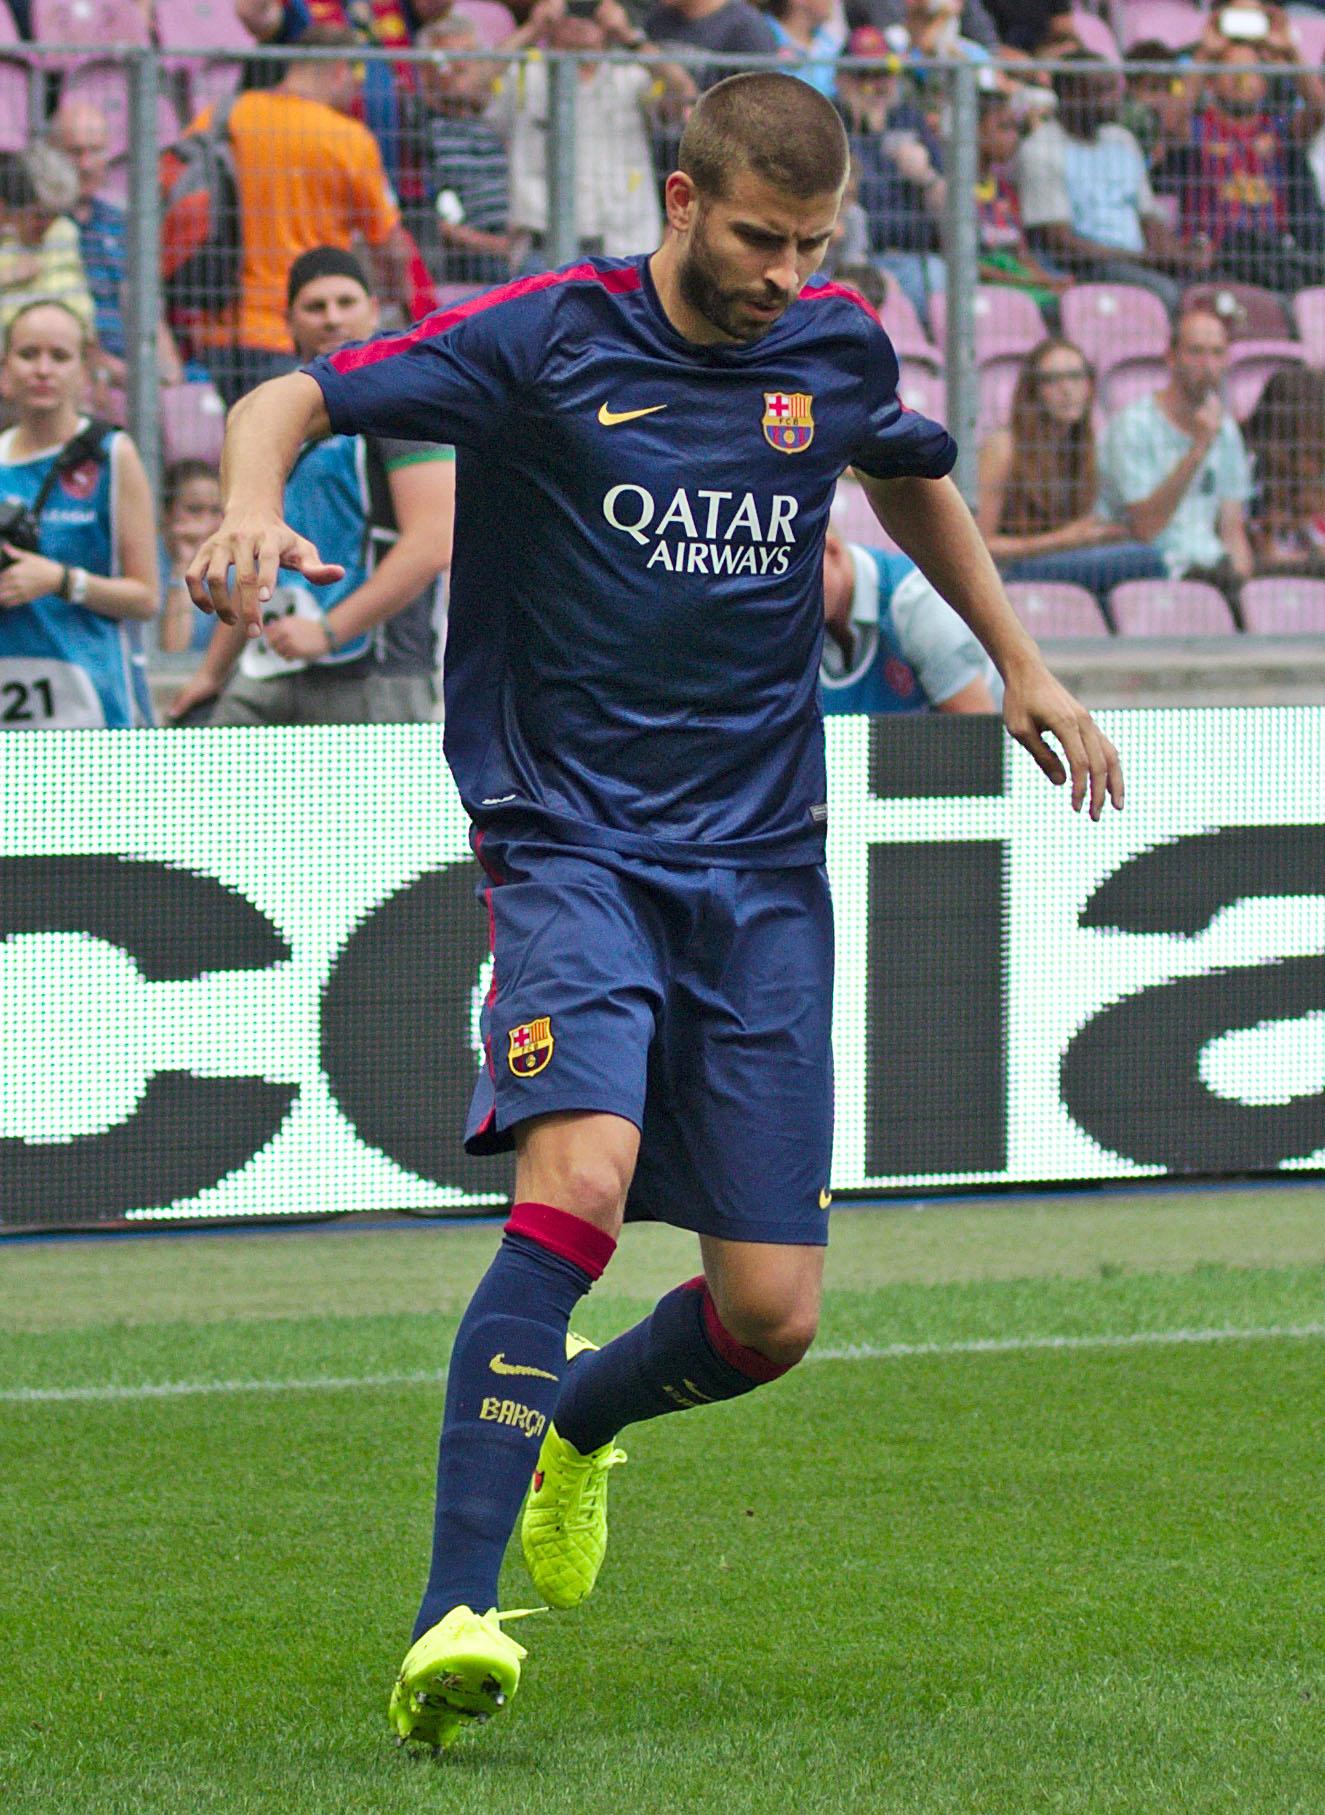 File:Barça - Napoli - 20140806 - Echauffement - Gerard Piqué ...